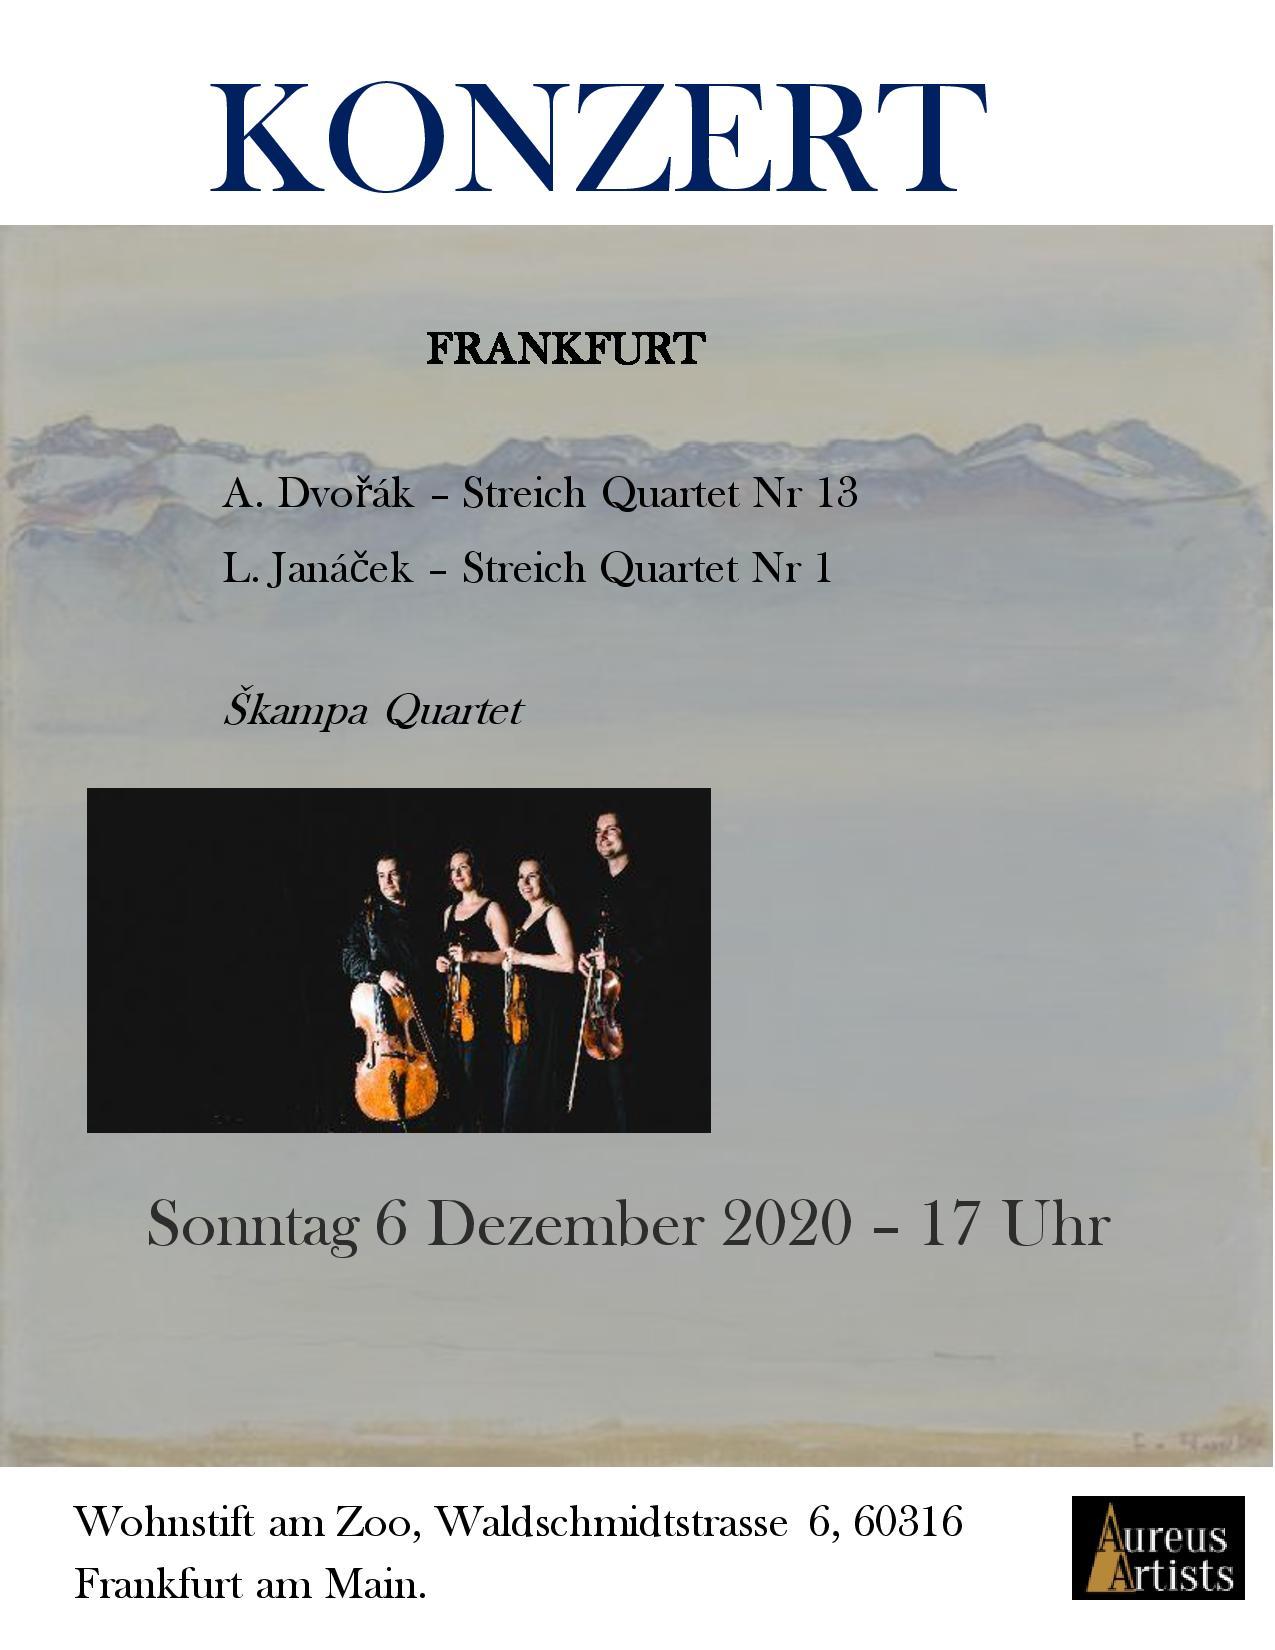 Frankfurt- 6 Dez